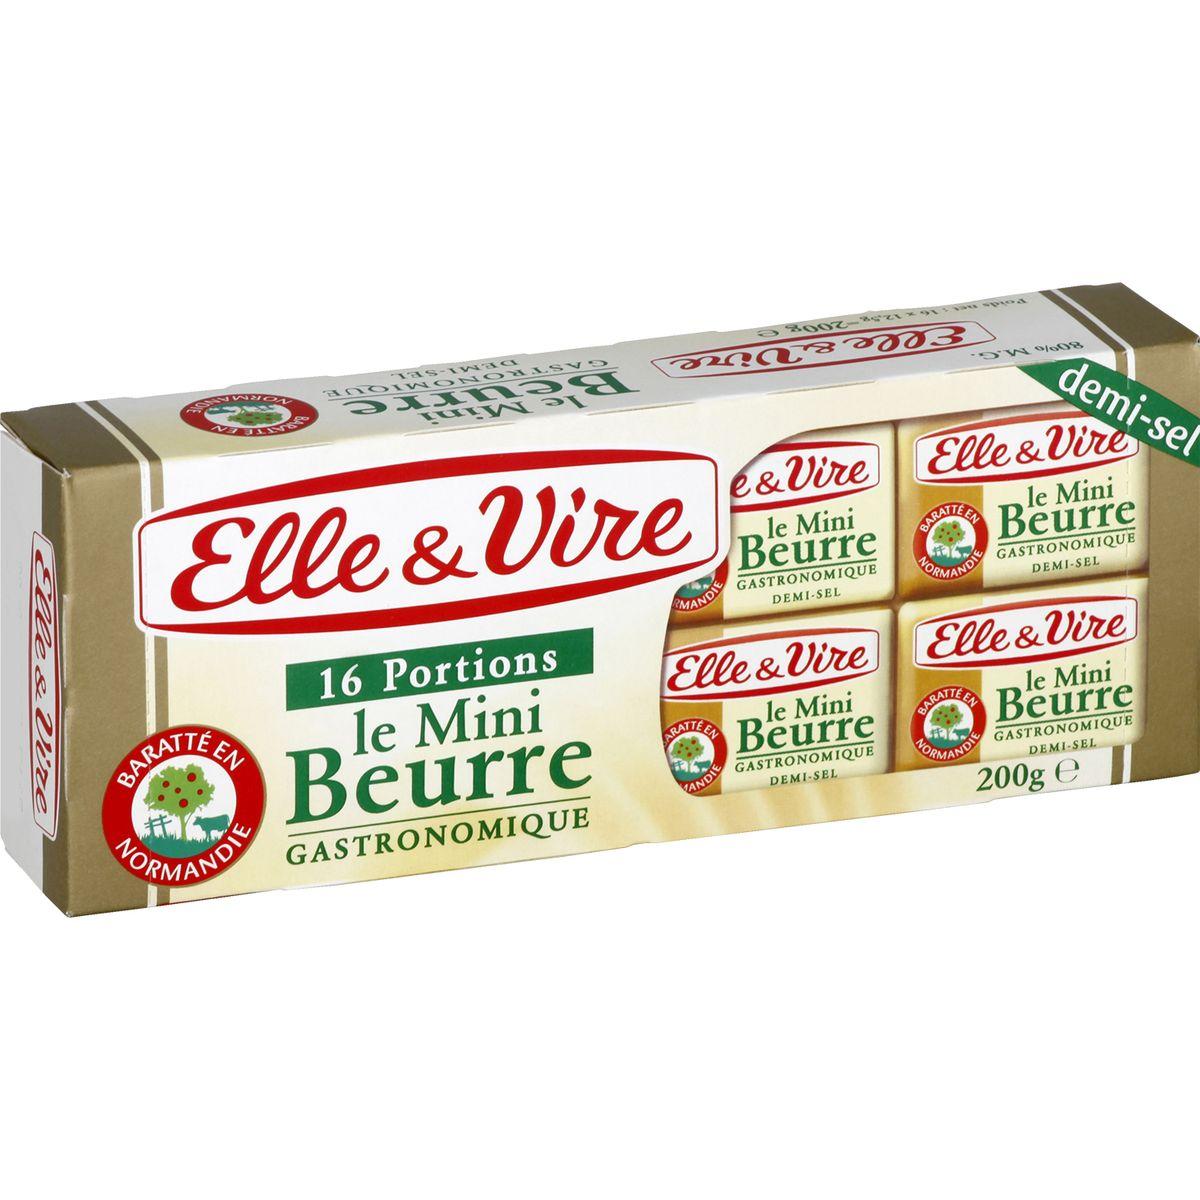 Mini Beurre demi-sel, Elle & Vire (16 x 12.5 g)